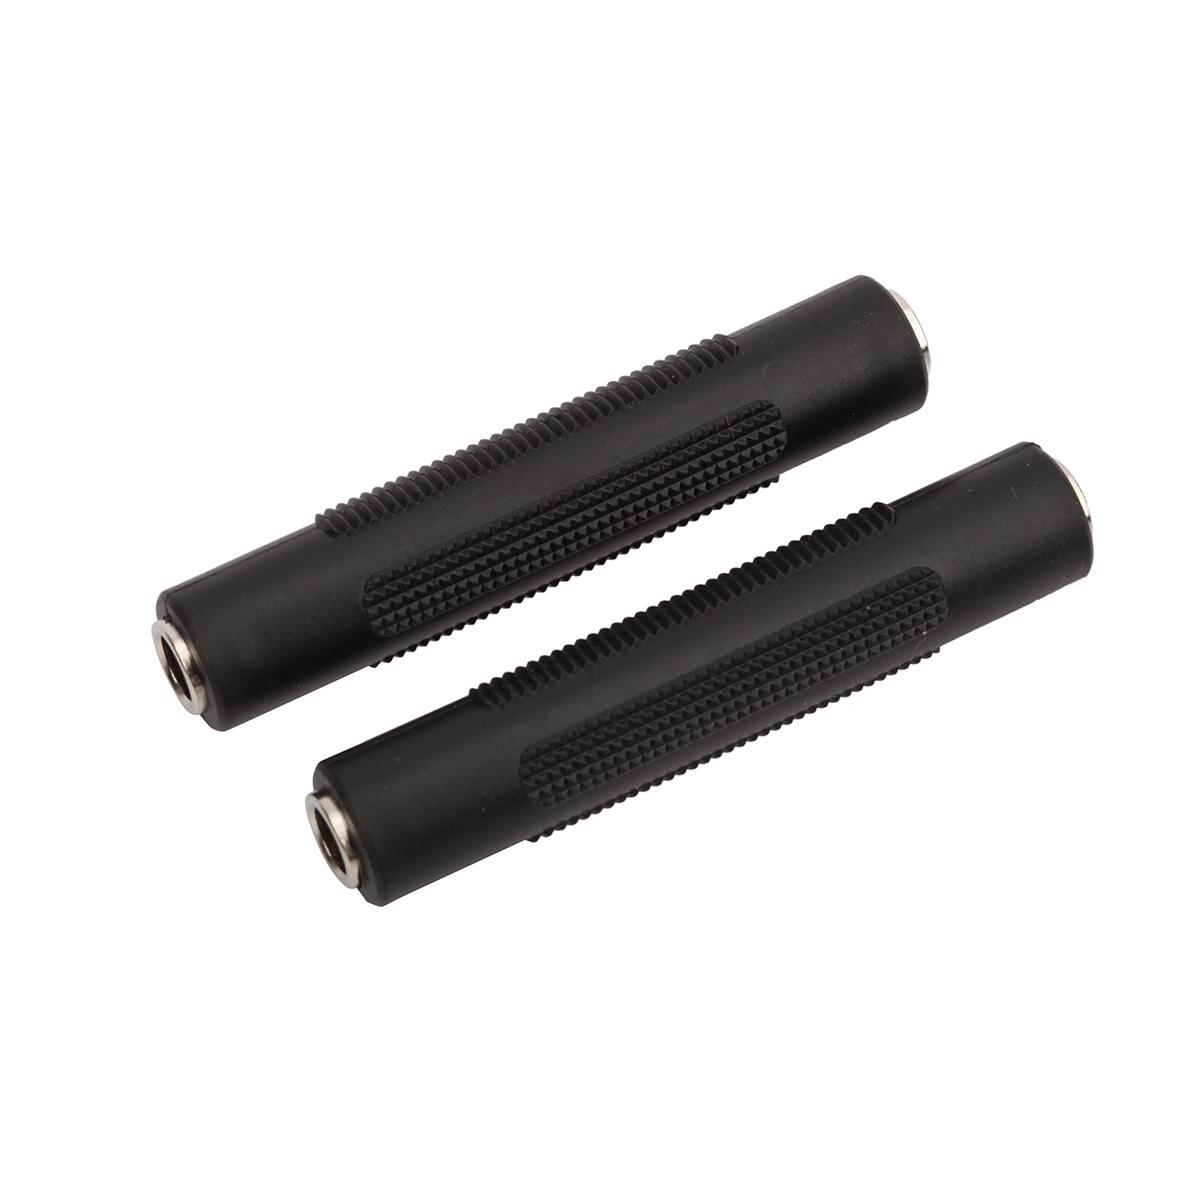 Shiver - Adaptateur 2x 6,35mm femelle / 6,35mm femelle